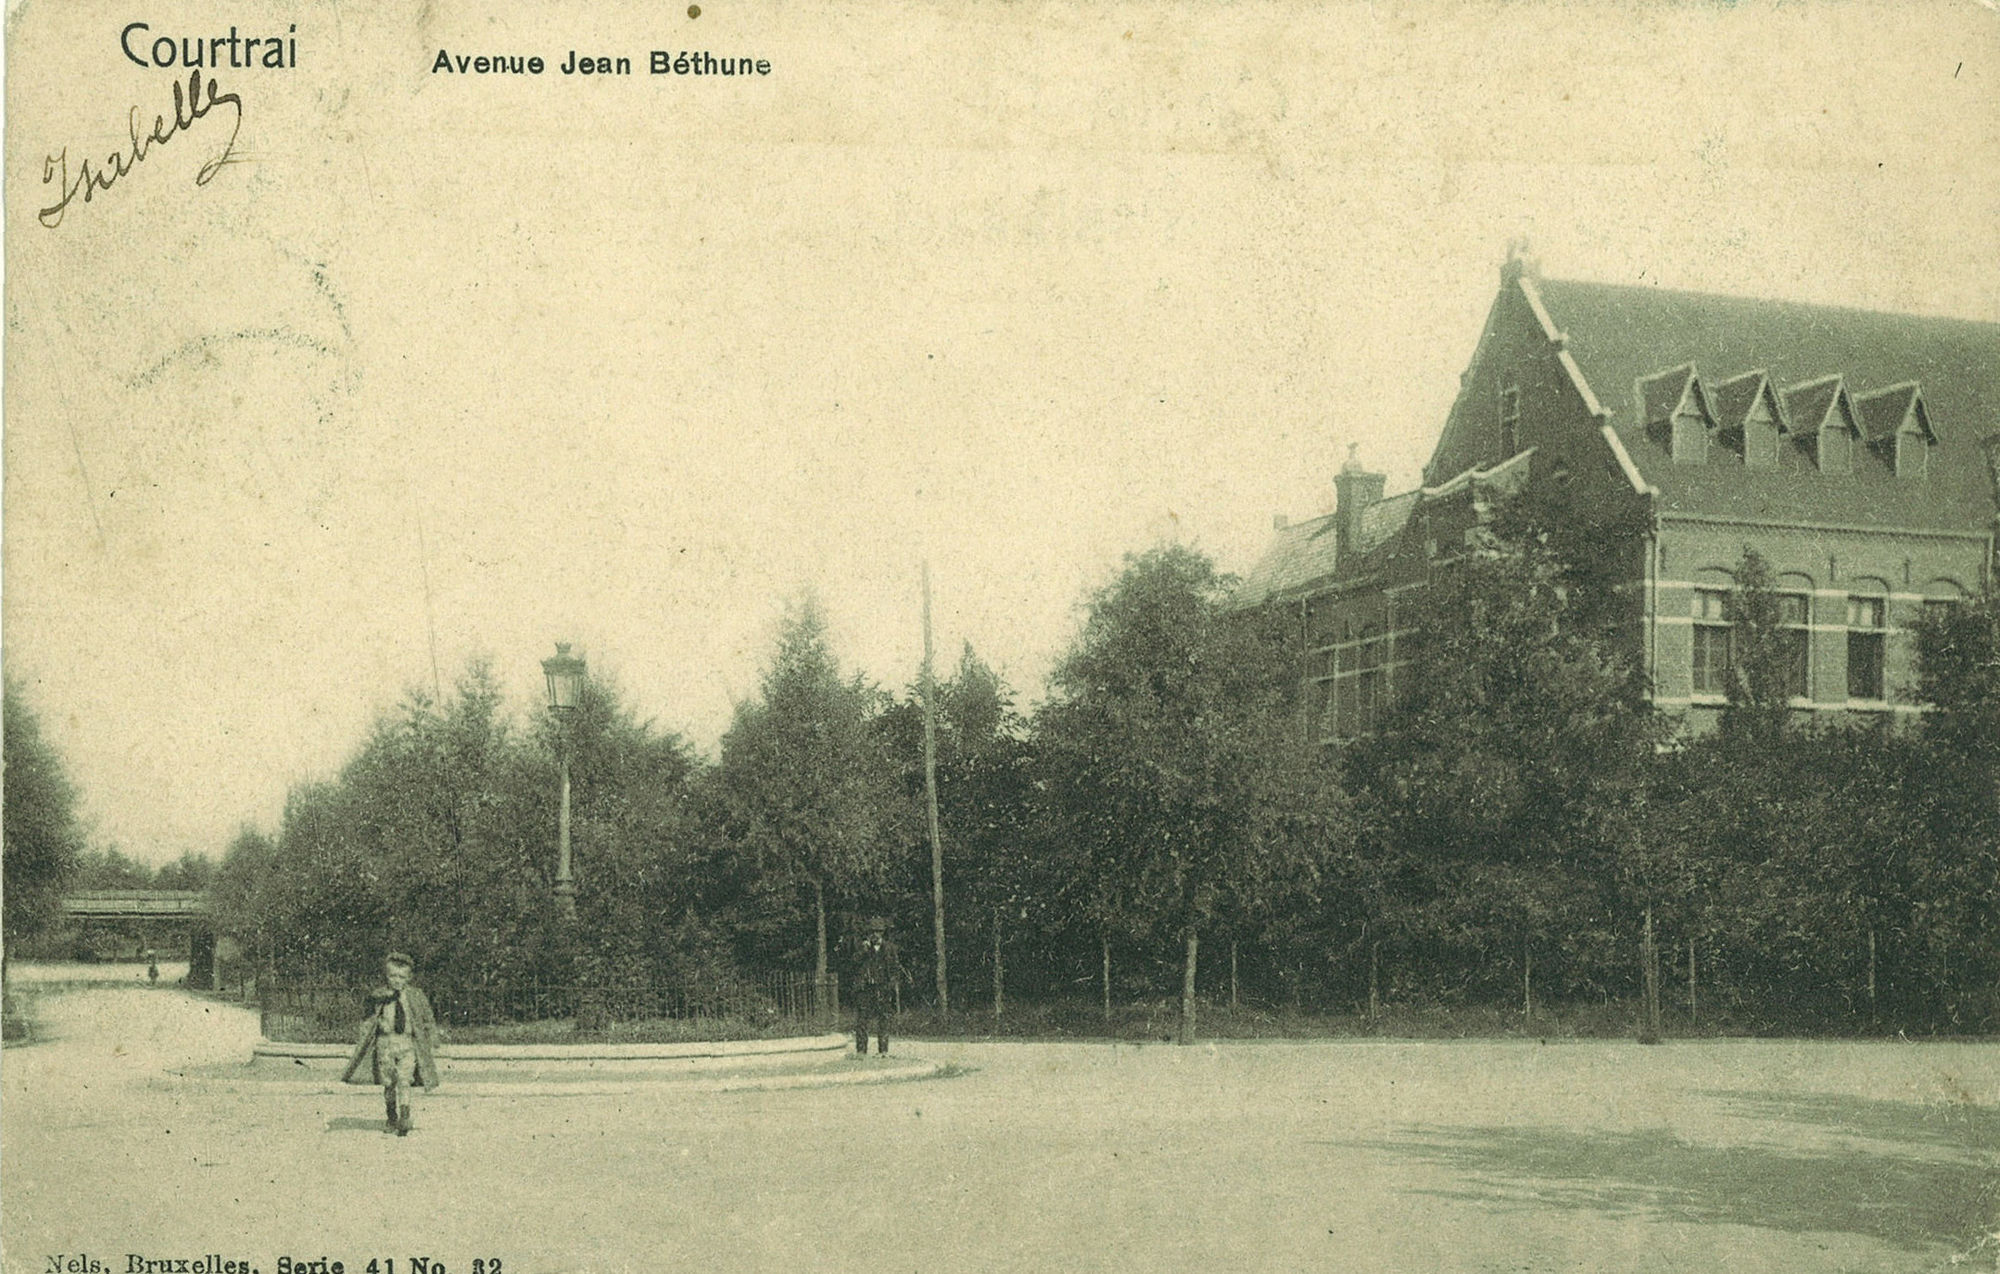 Baron J. de Bethunestraat: Avenue Jean Bethune